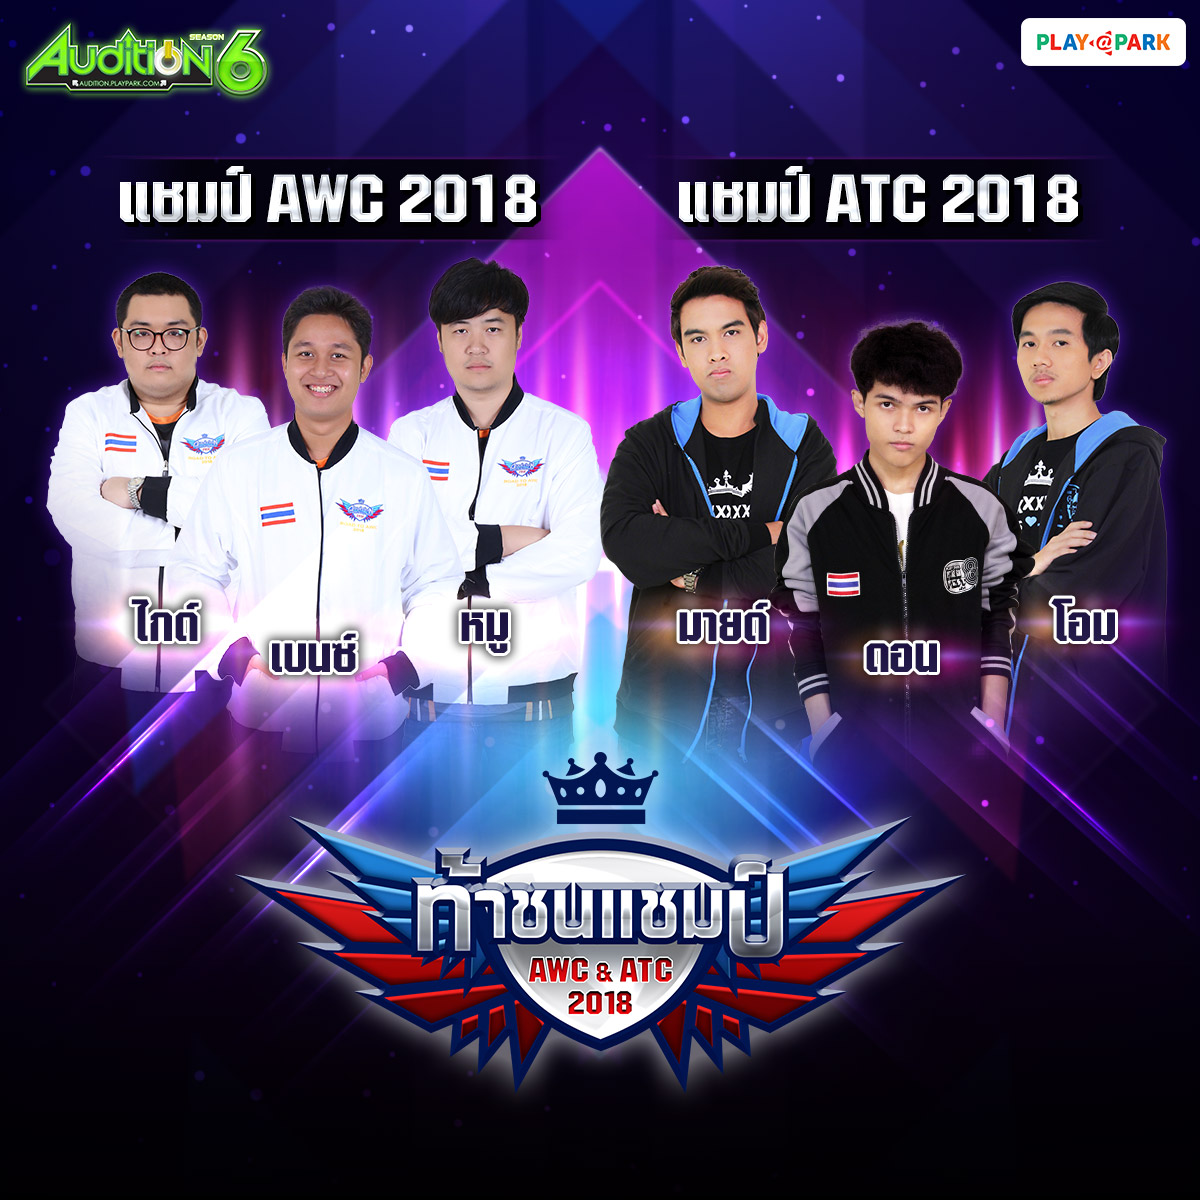 [AUDITION] ท้าชนแชมป์โลก & แชมป์ ATC 2018